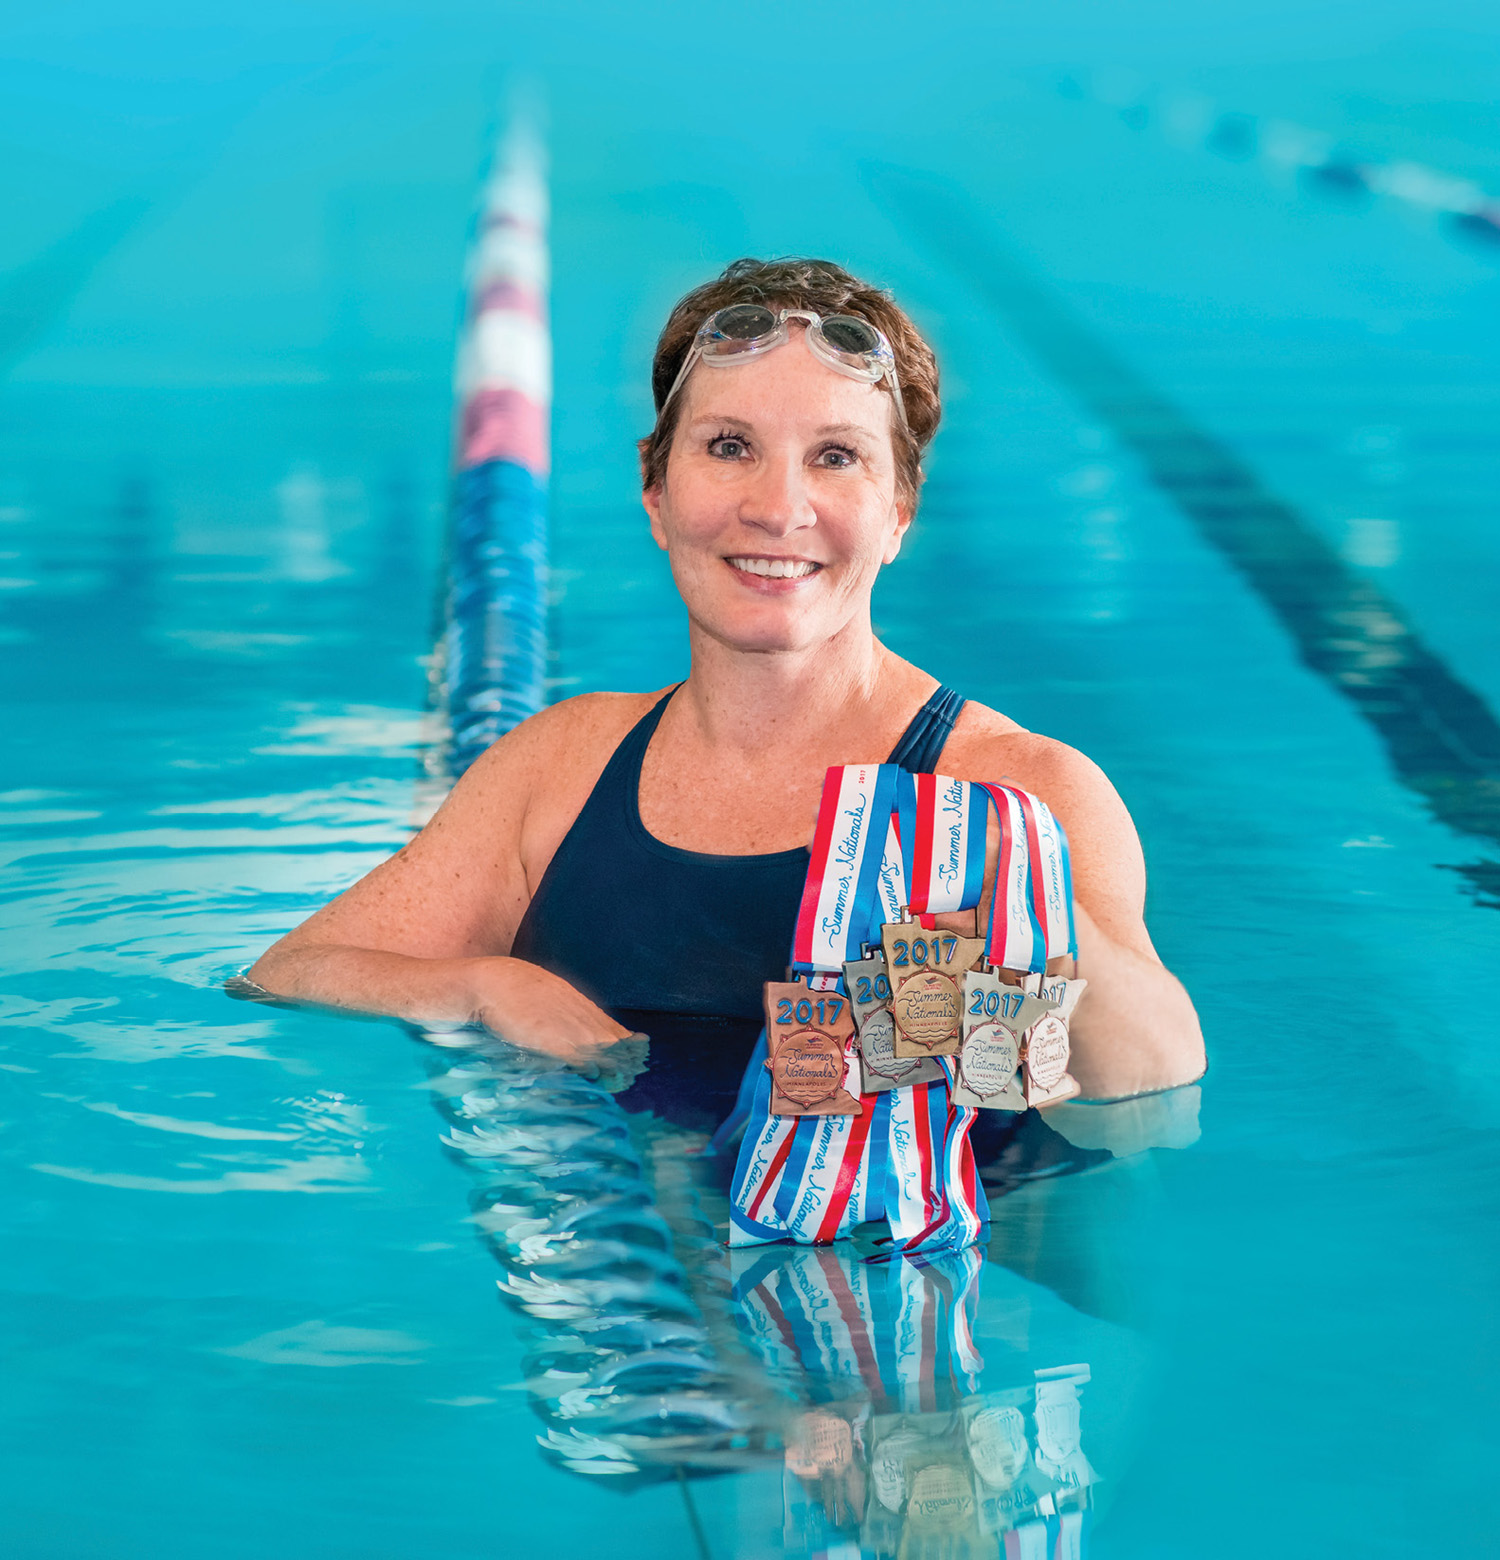 photo of Jan Hildebrandt in a swimming pool